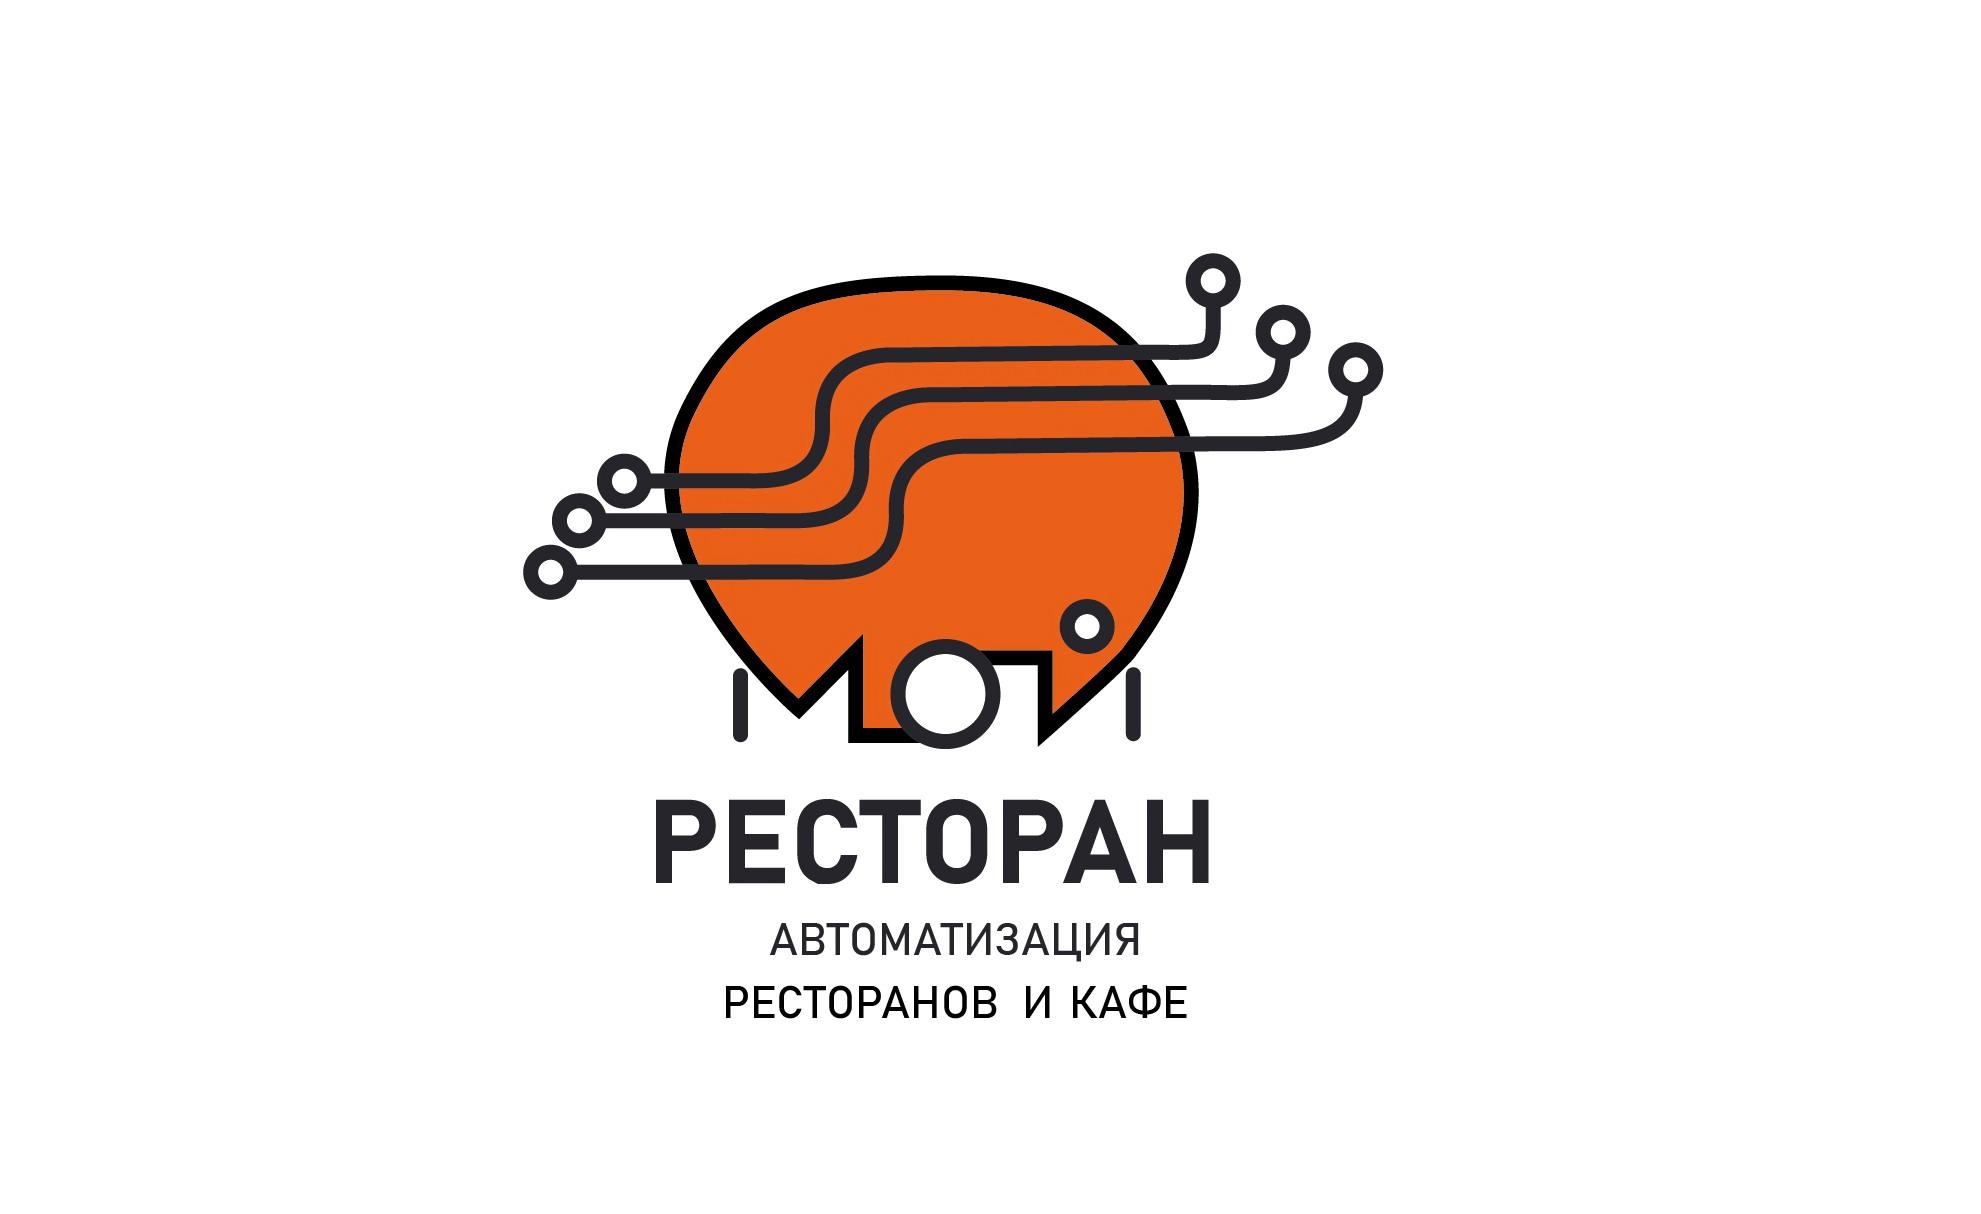 Разработать логотип и фавикон для IT- компании фото f_9135d557a5b05c94.jpg